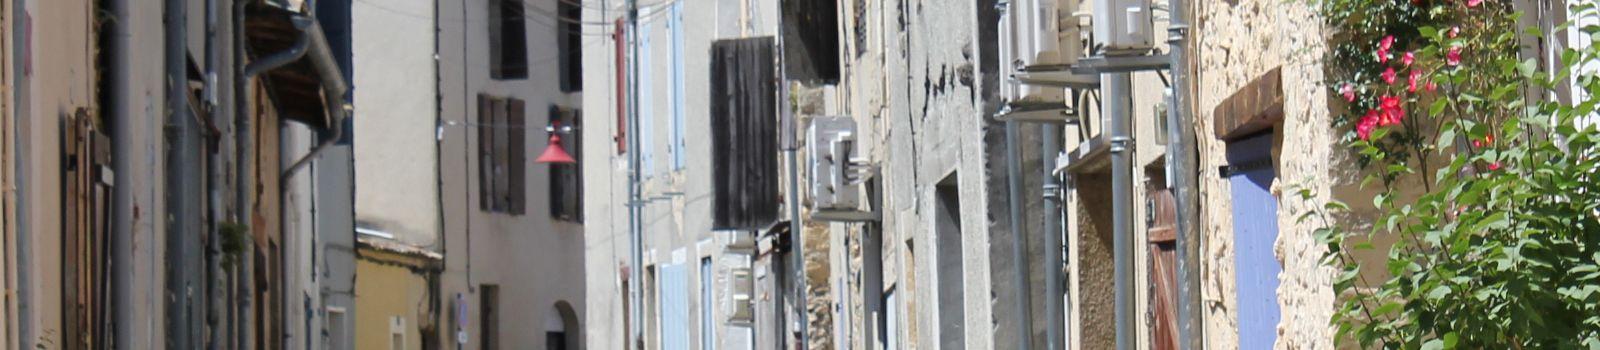 Rue de Langon